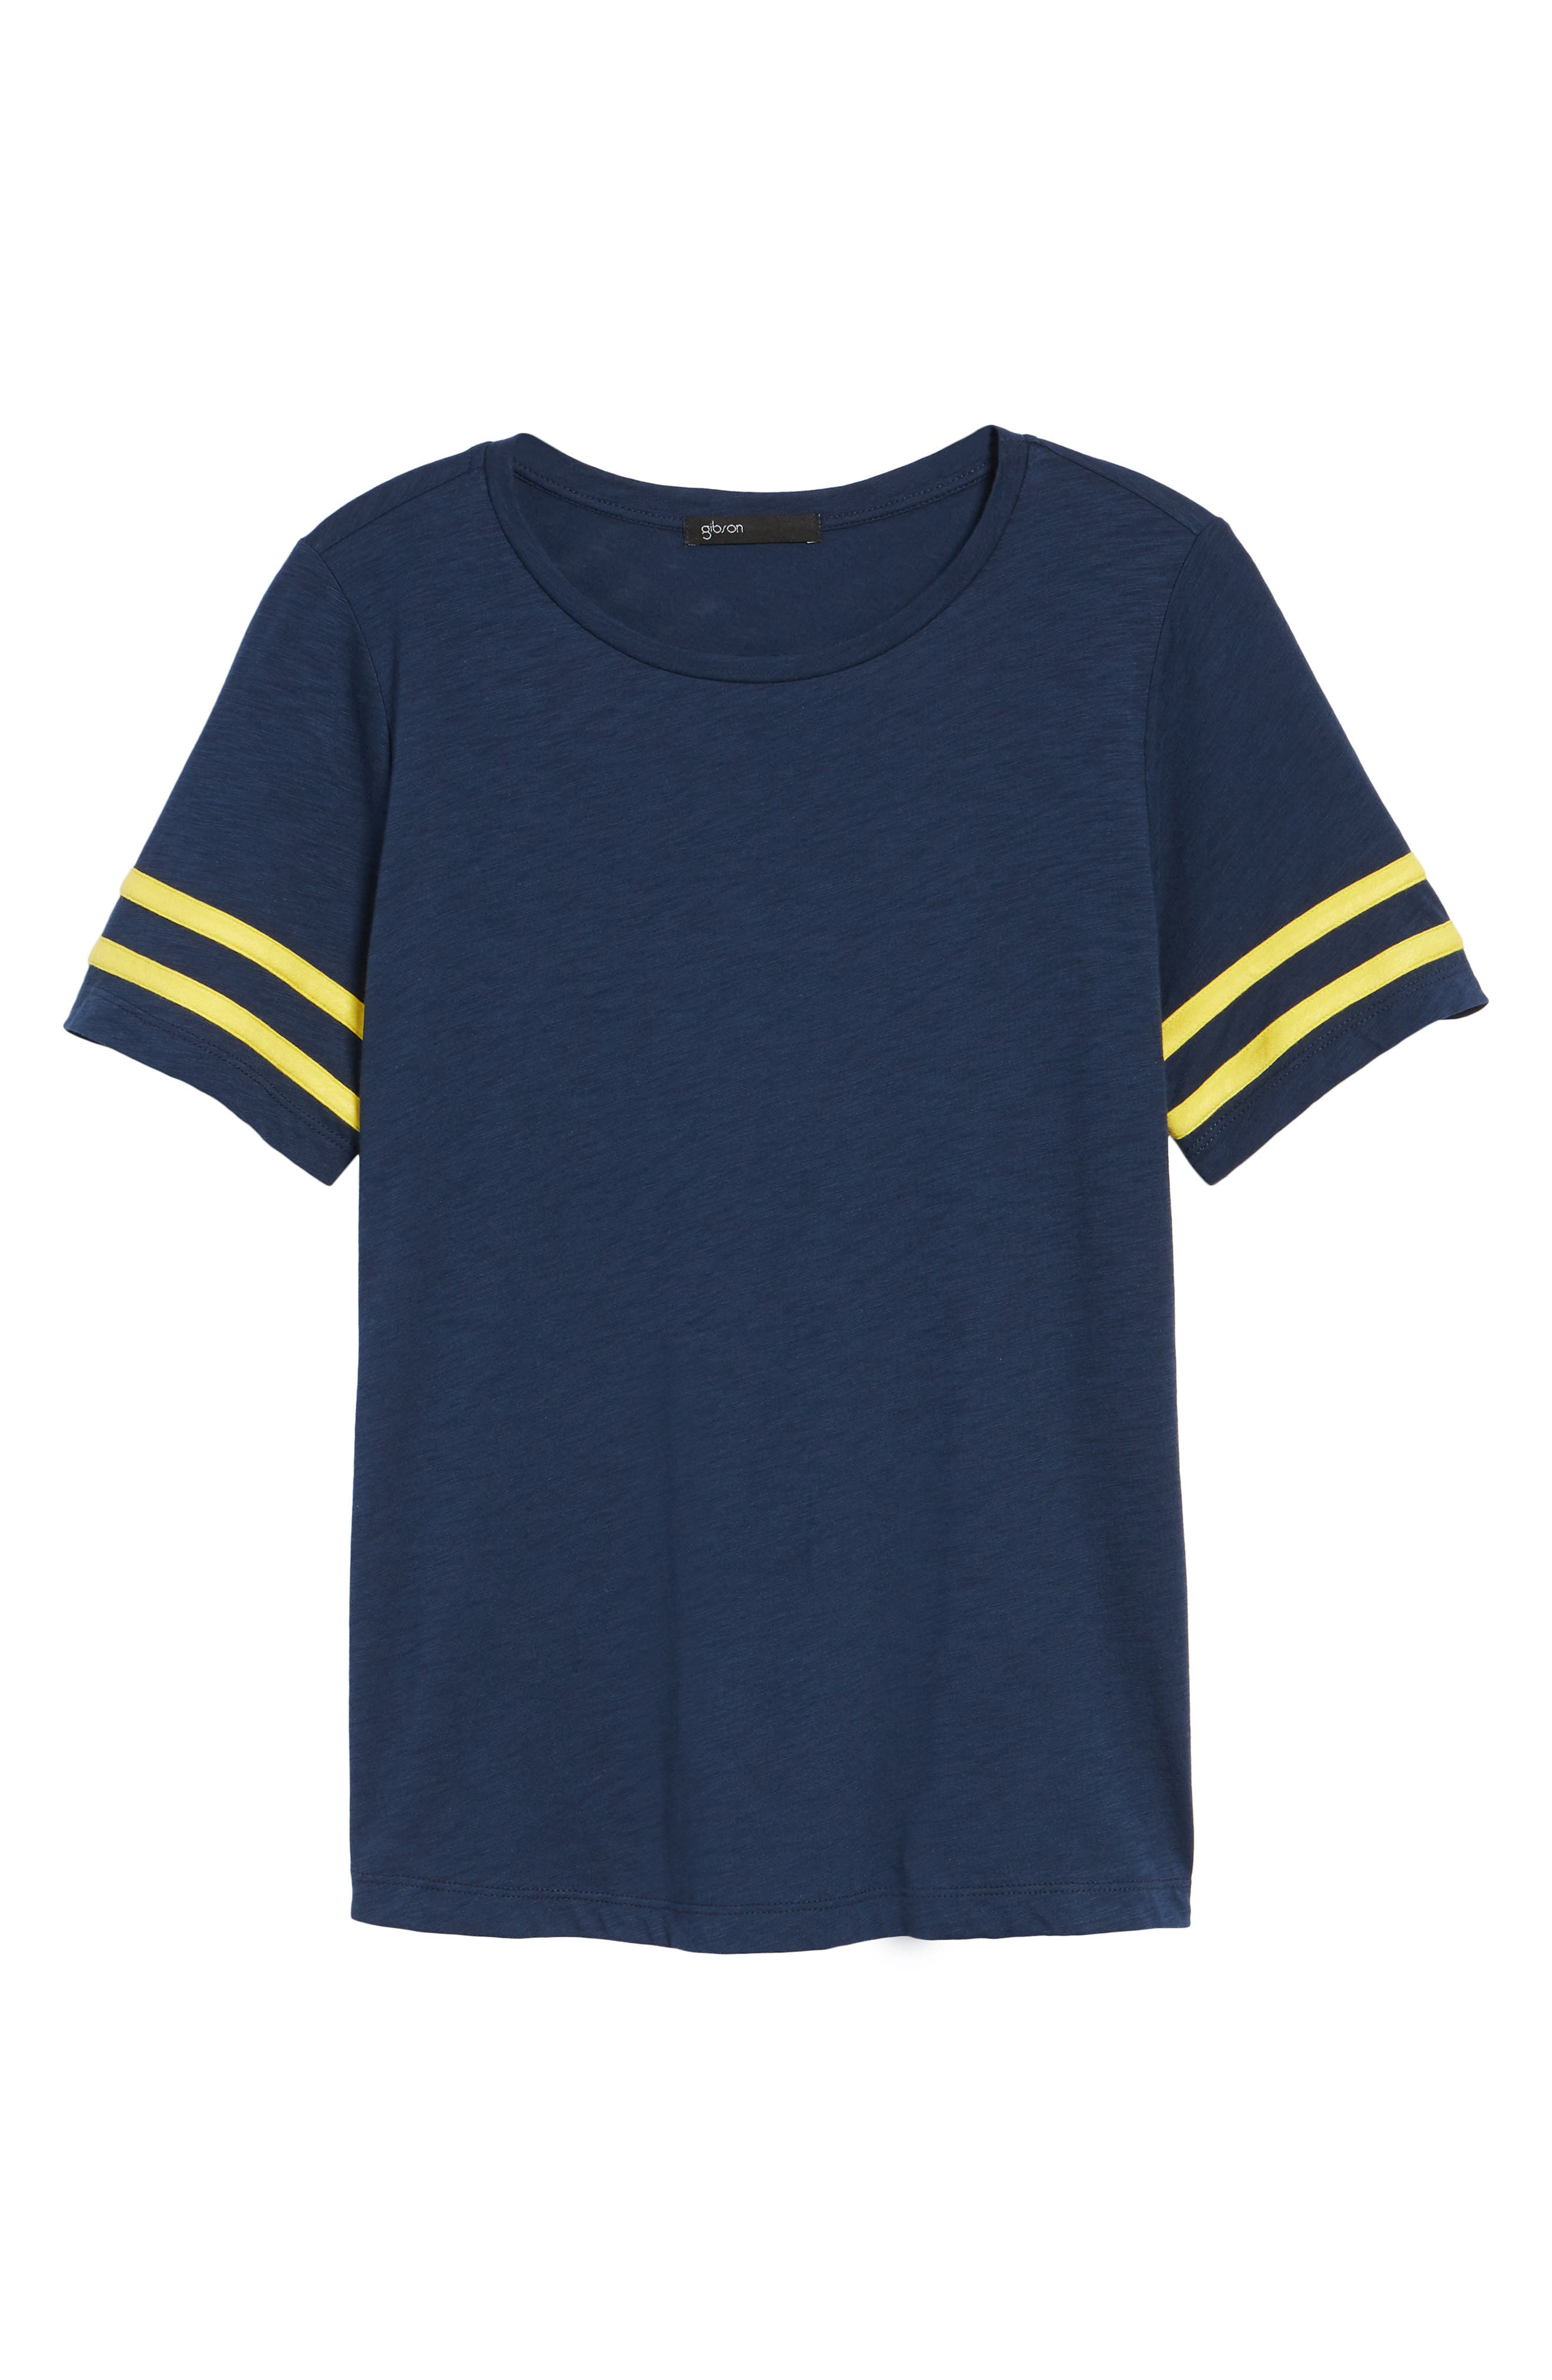 Stripe Sleeve Cotton Blend Athletic Tee,                             Alternate thumbnail 24, color,